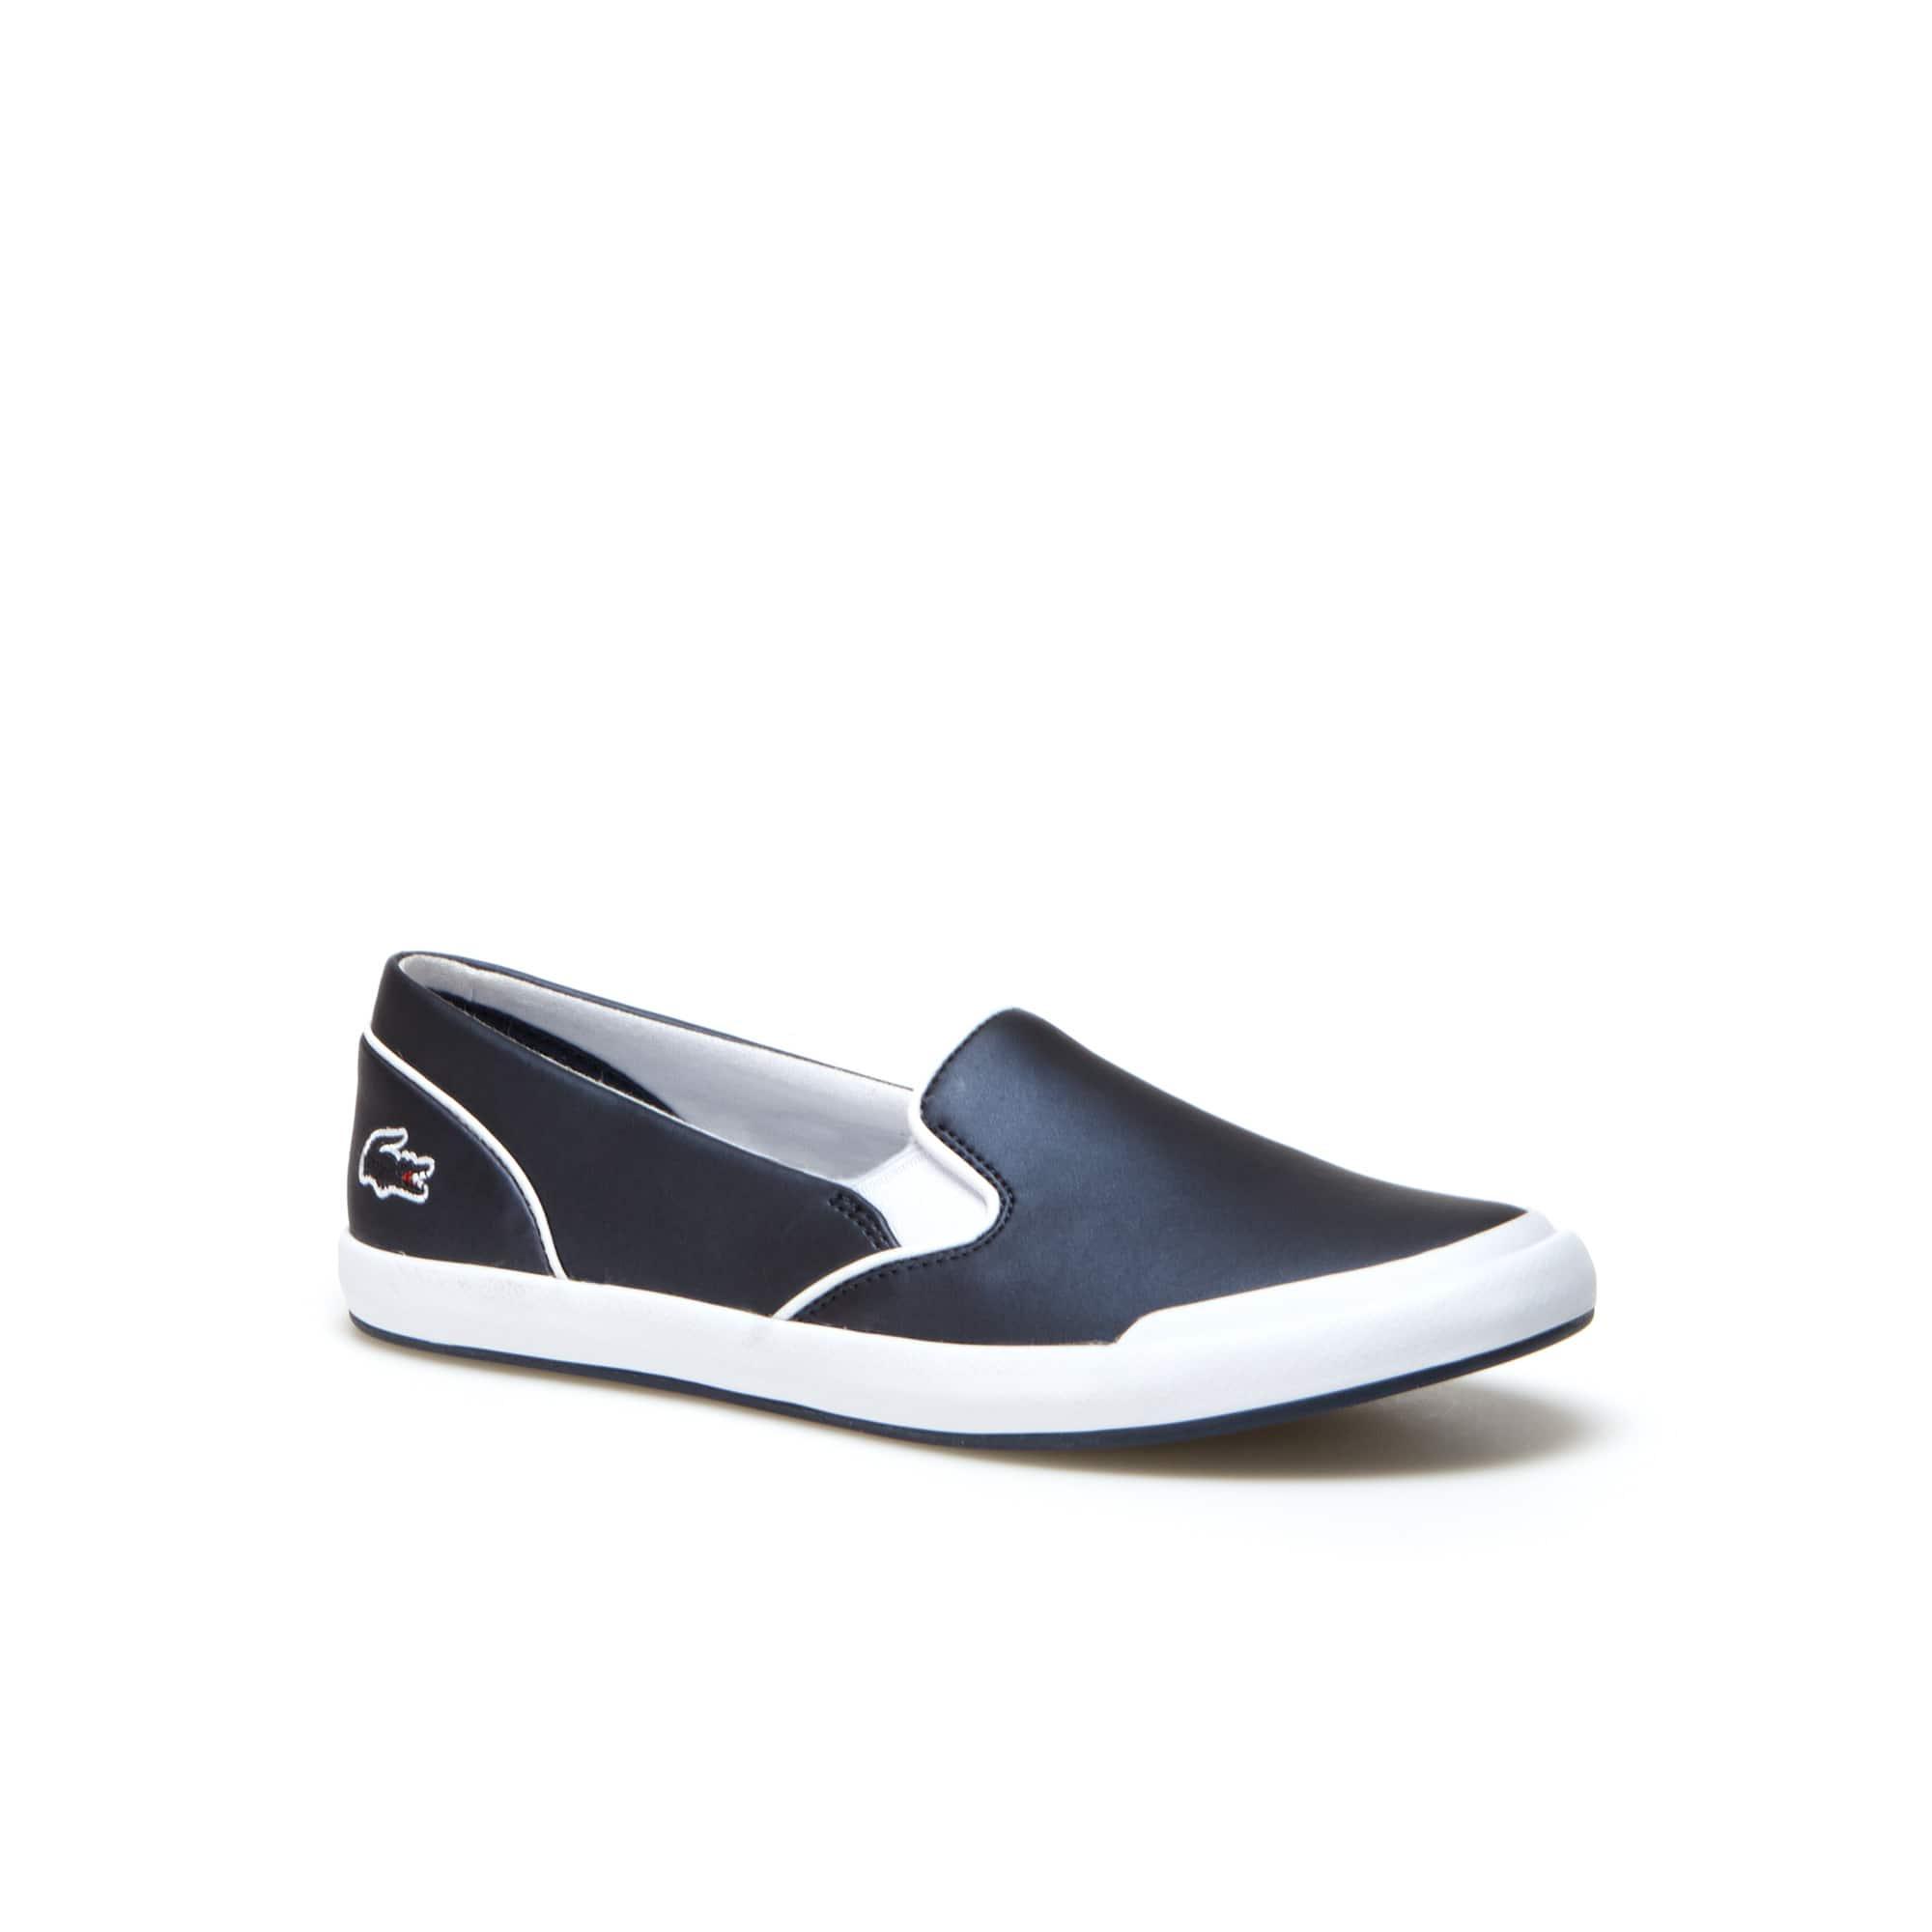 Women's Lancelle Slip-on Leather Sneakers